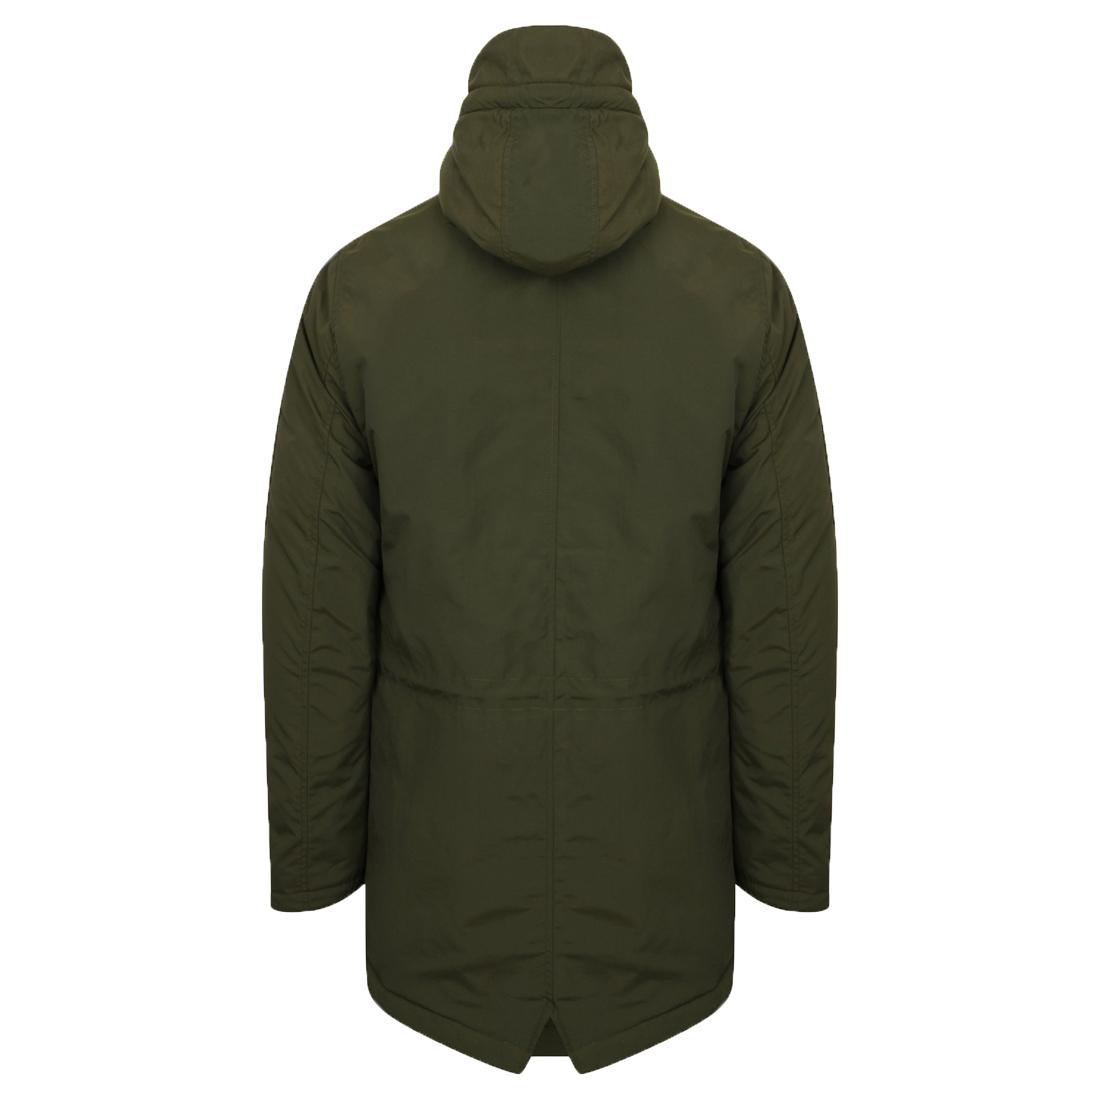 Mens Winter Coat Army Style Fishtail Parka Jacket Mod By Tokyo ...